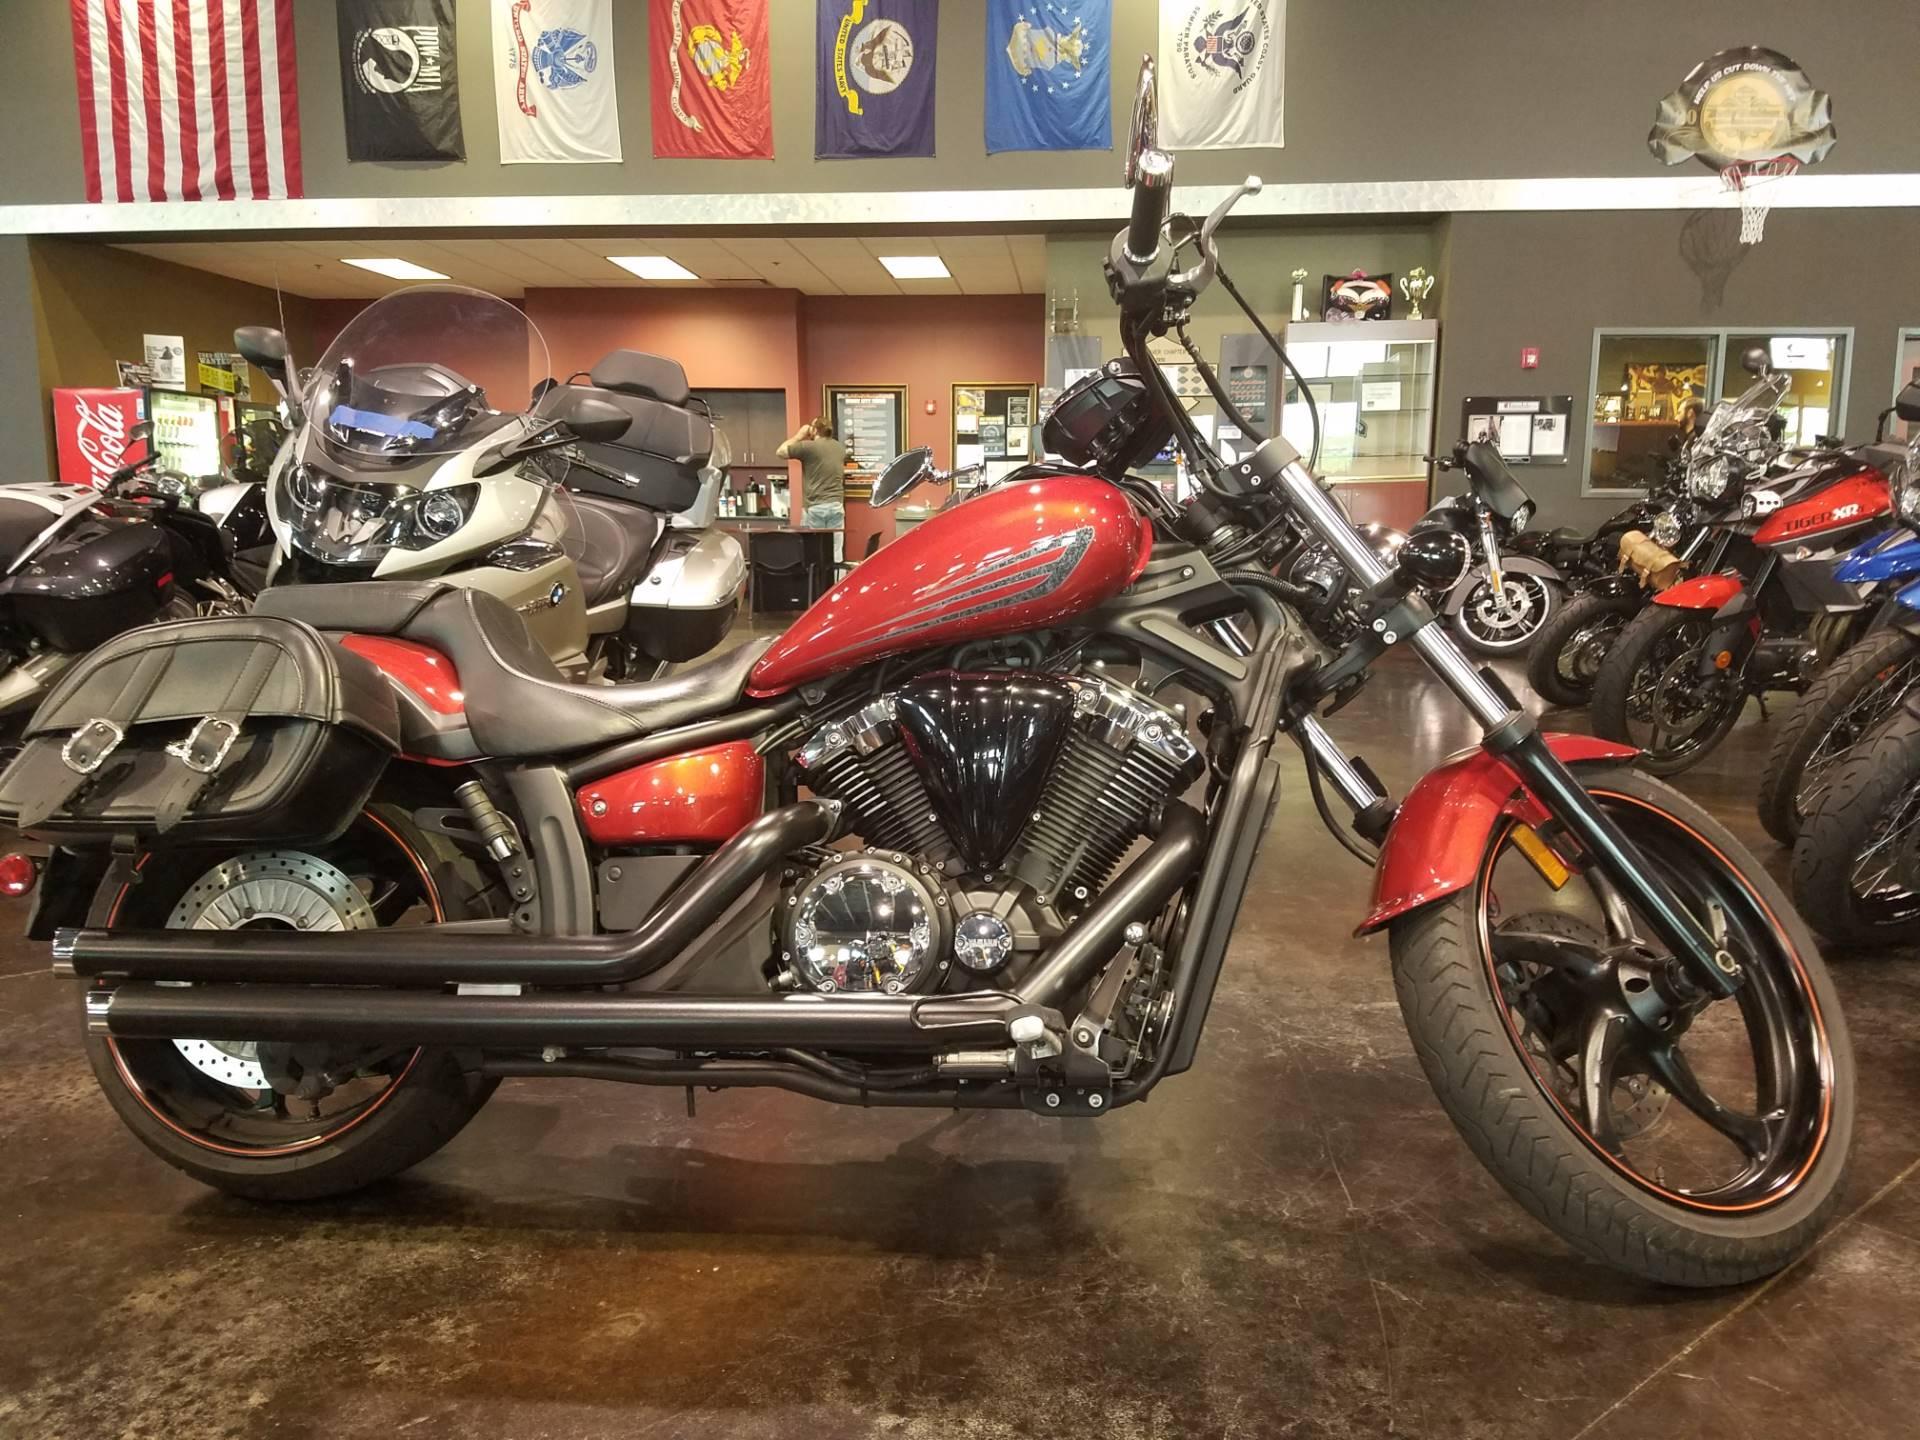 2012 Yamaha Stryker for sale 43997